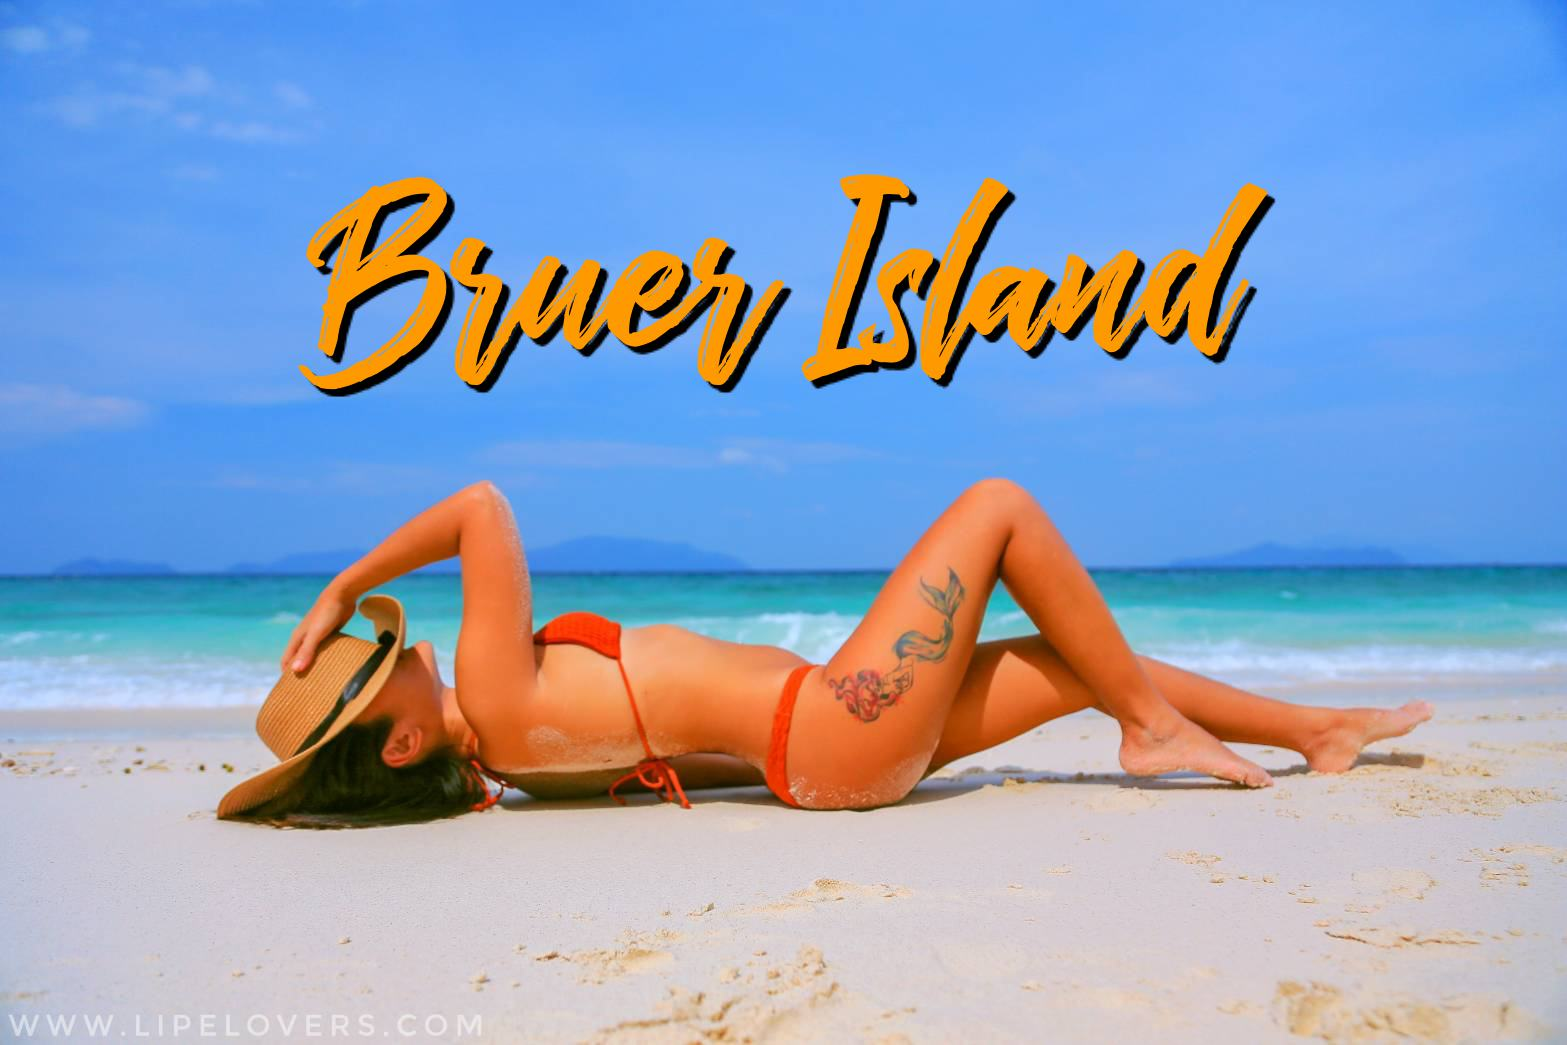 Bruer island